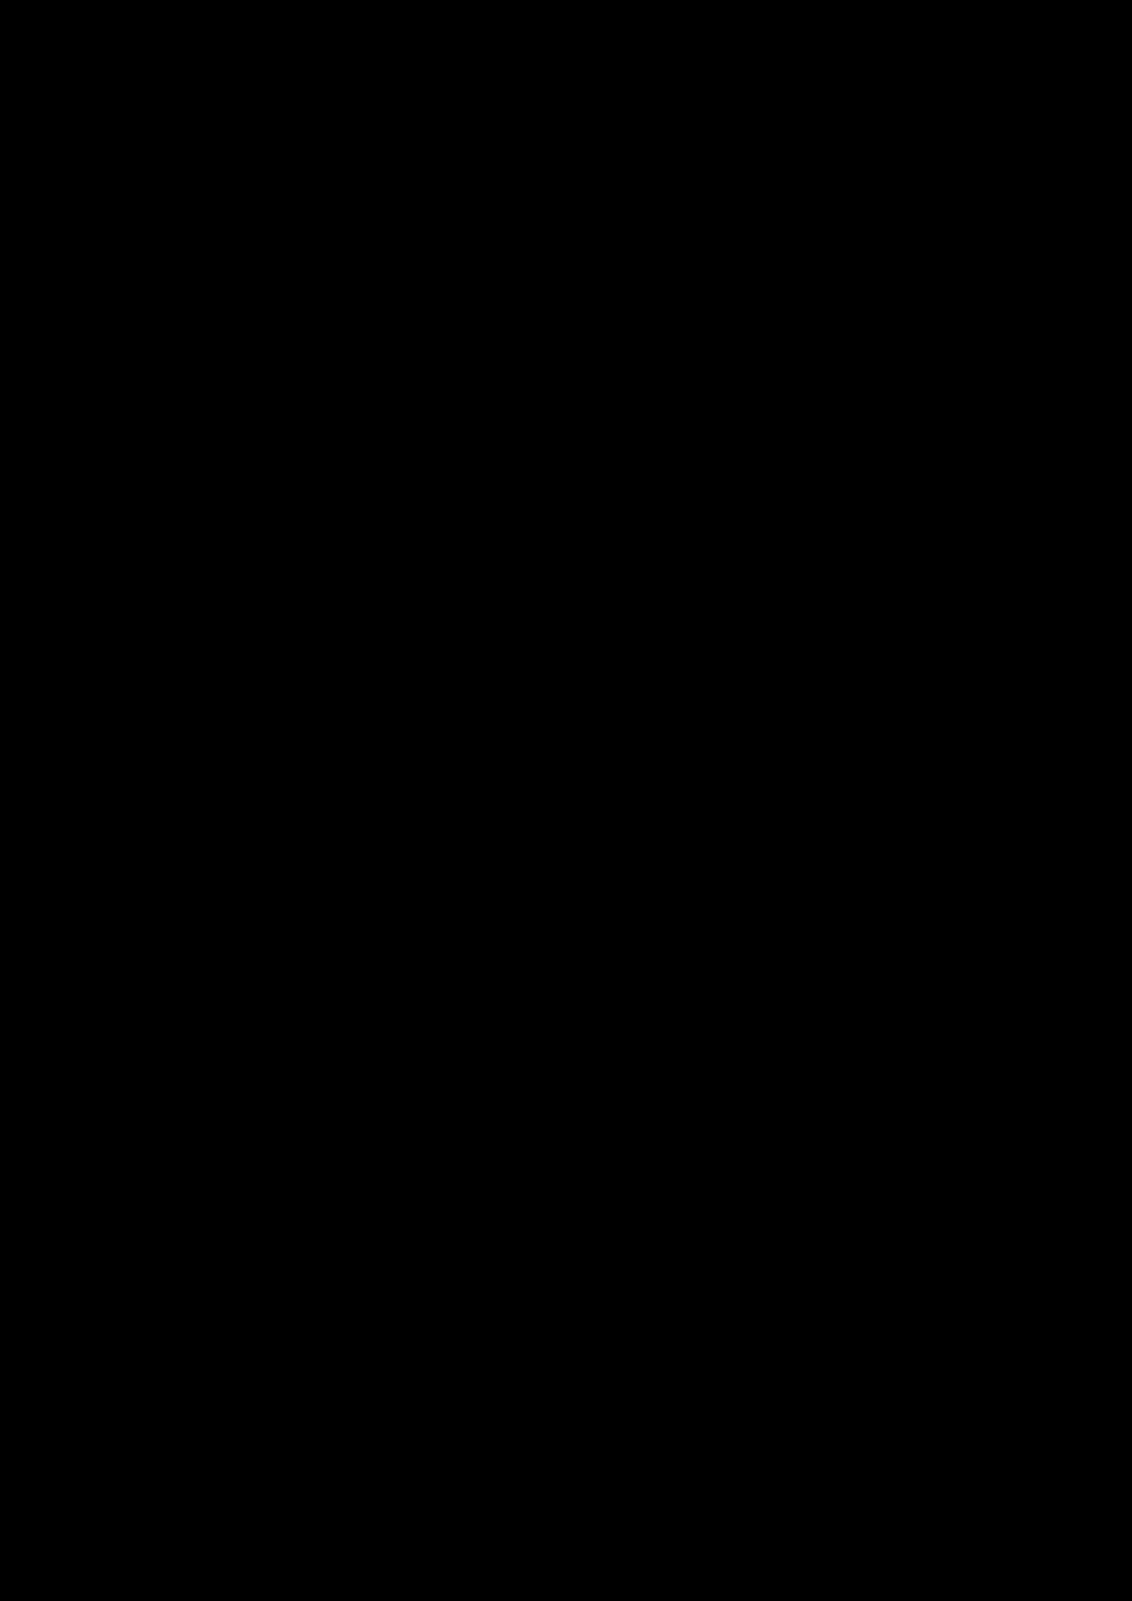 Ot Bolshogo Uma slide, Image 2